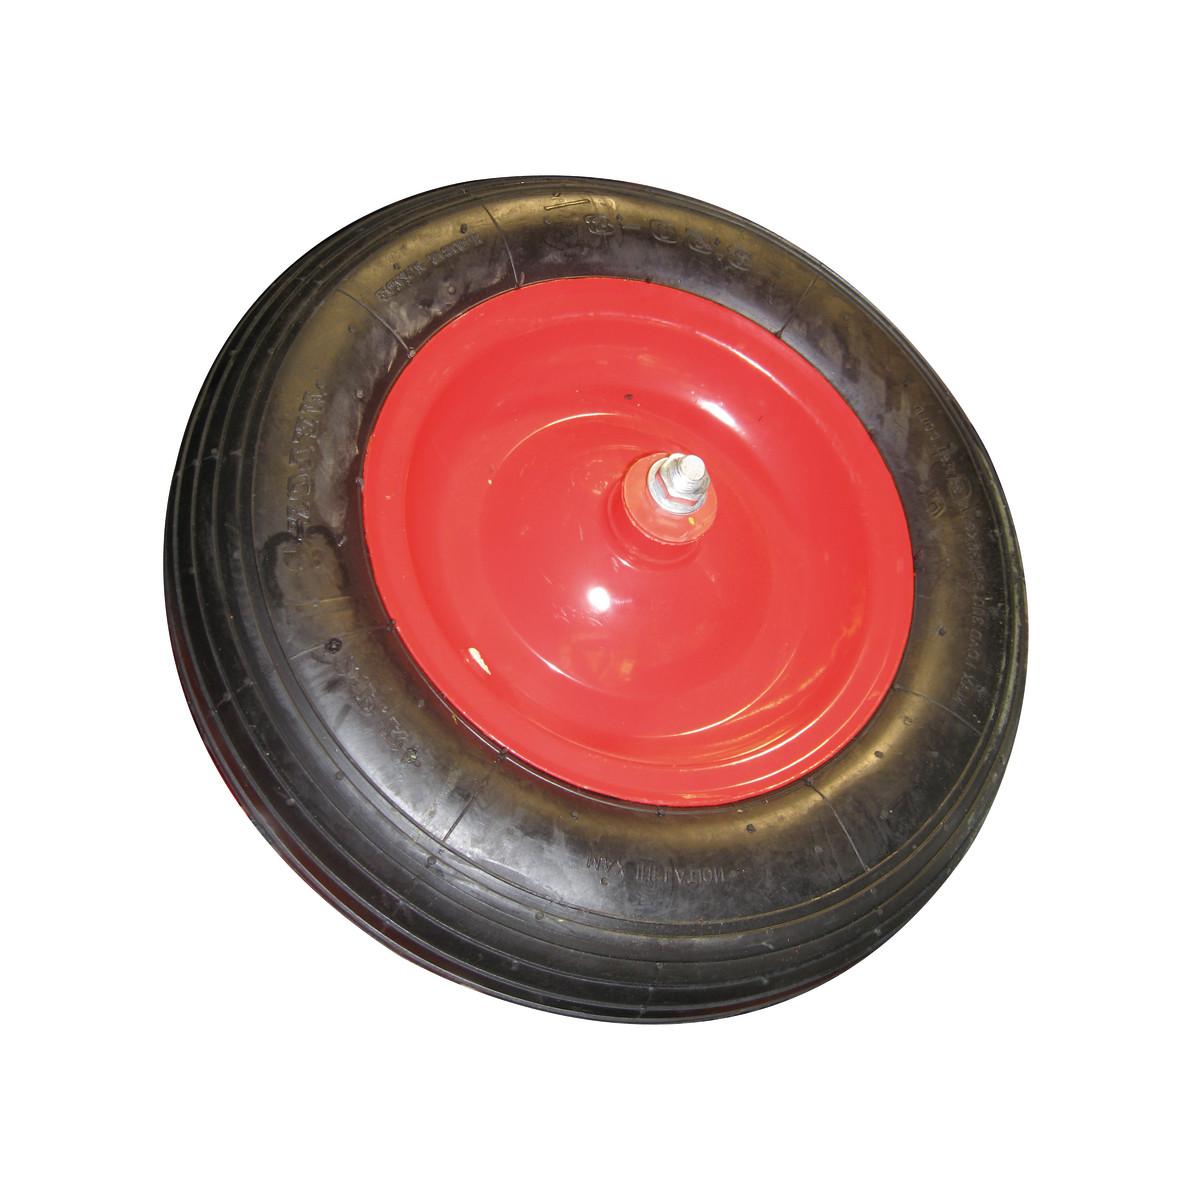 Carriola tela richiudibile ruota piena foglie giardino prezzo e offerte sottocosto for Carriola leroy merlin